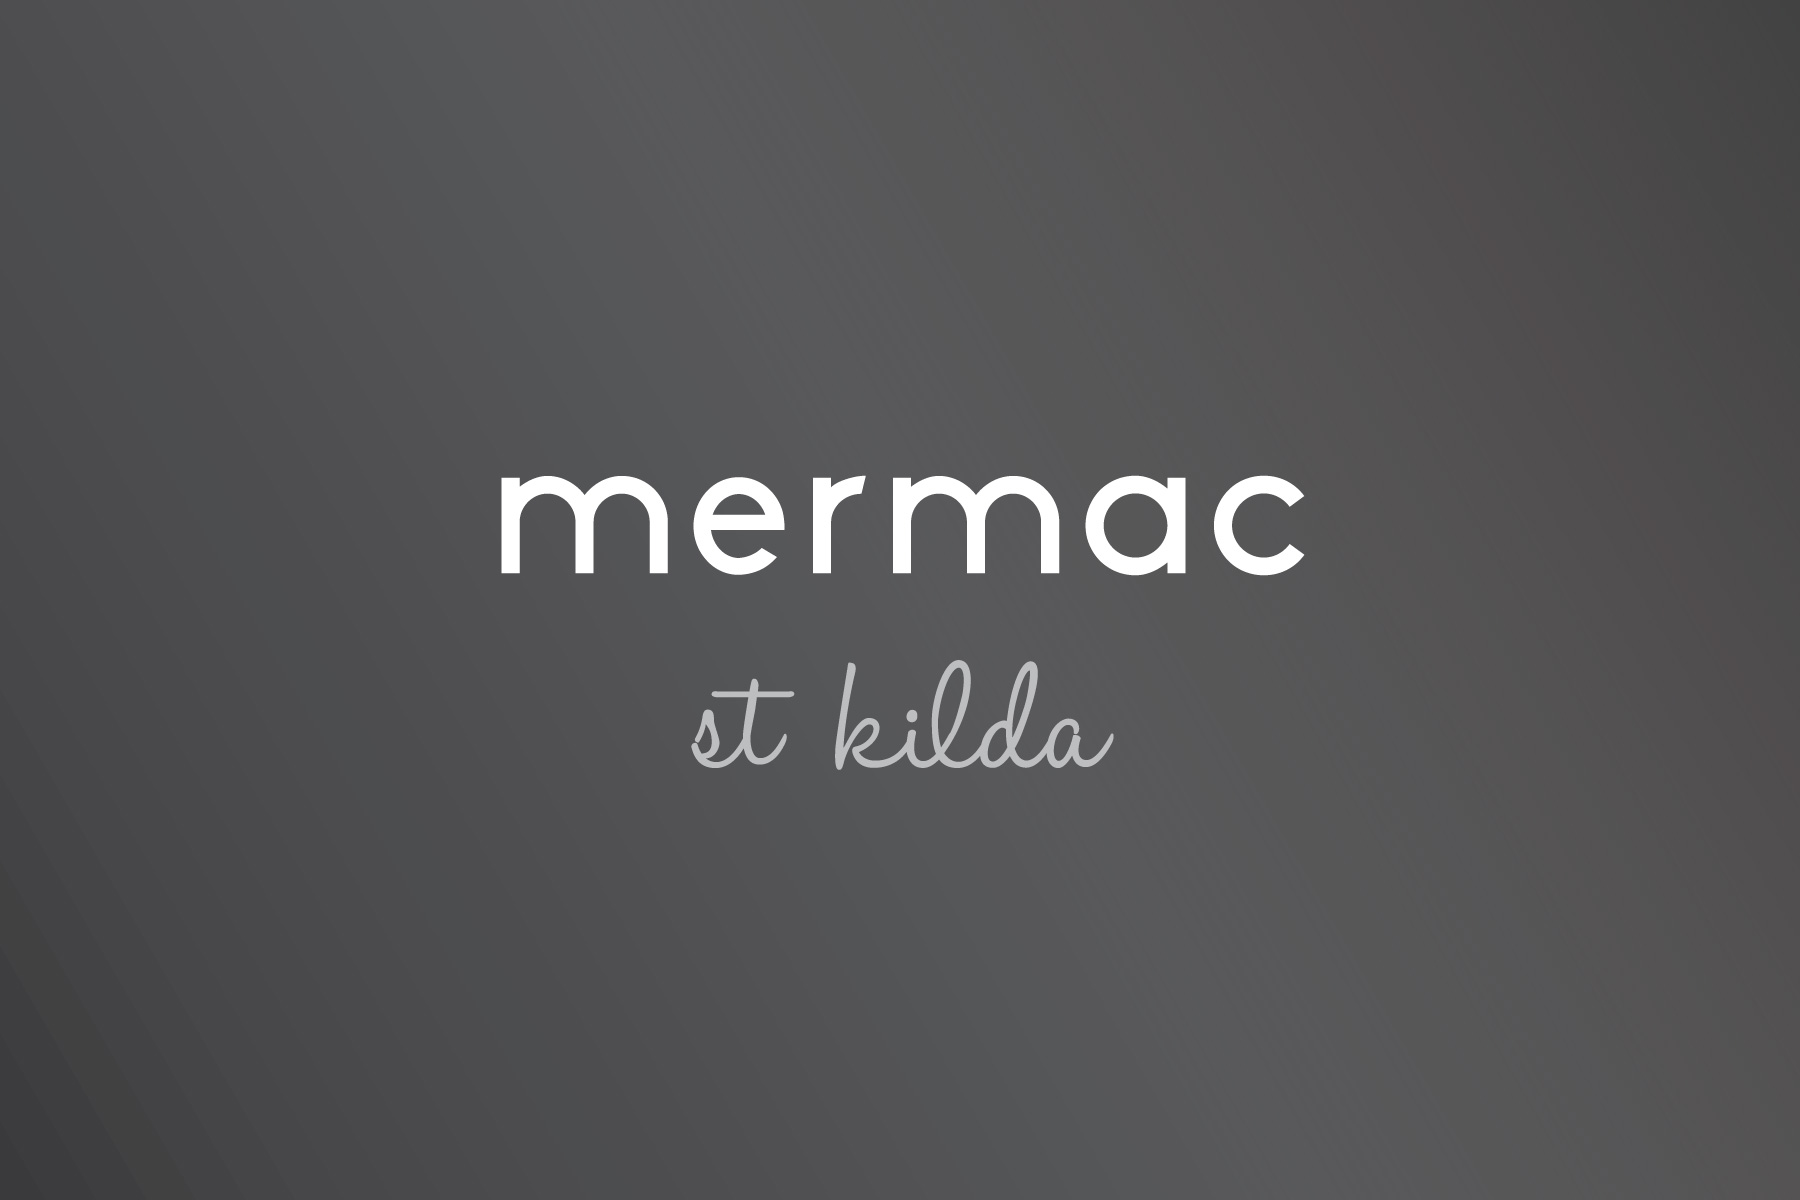 Mermac St Kilda Residential Property Development